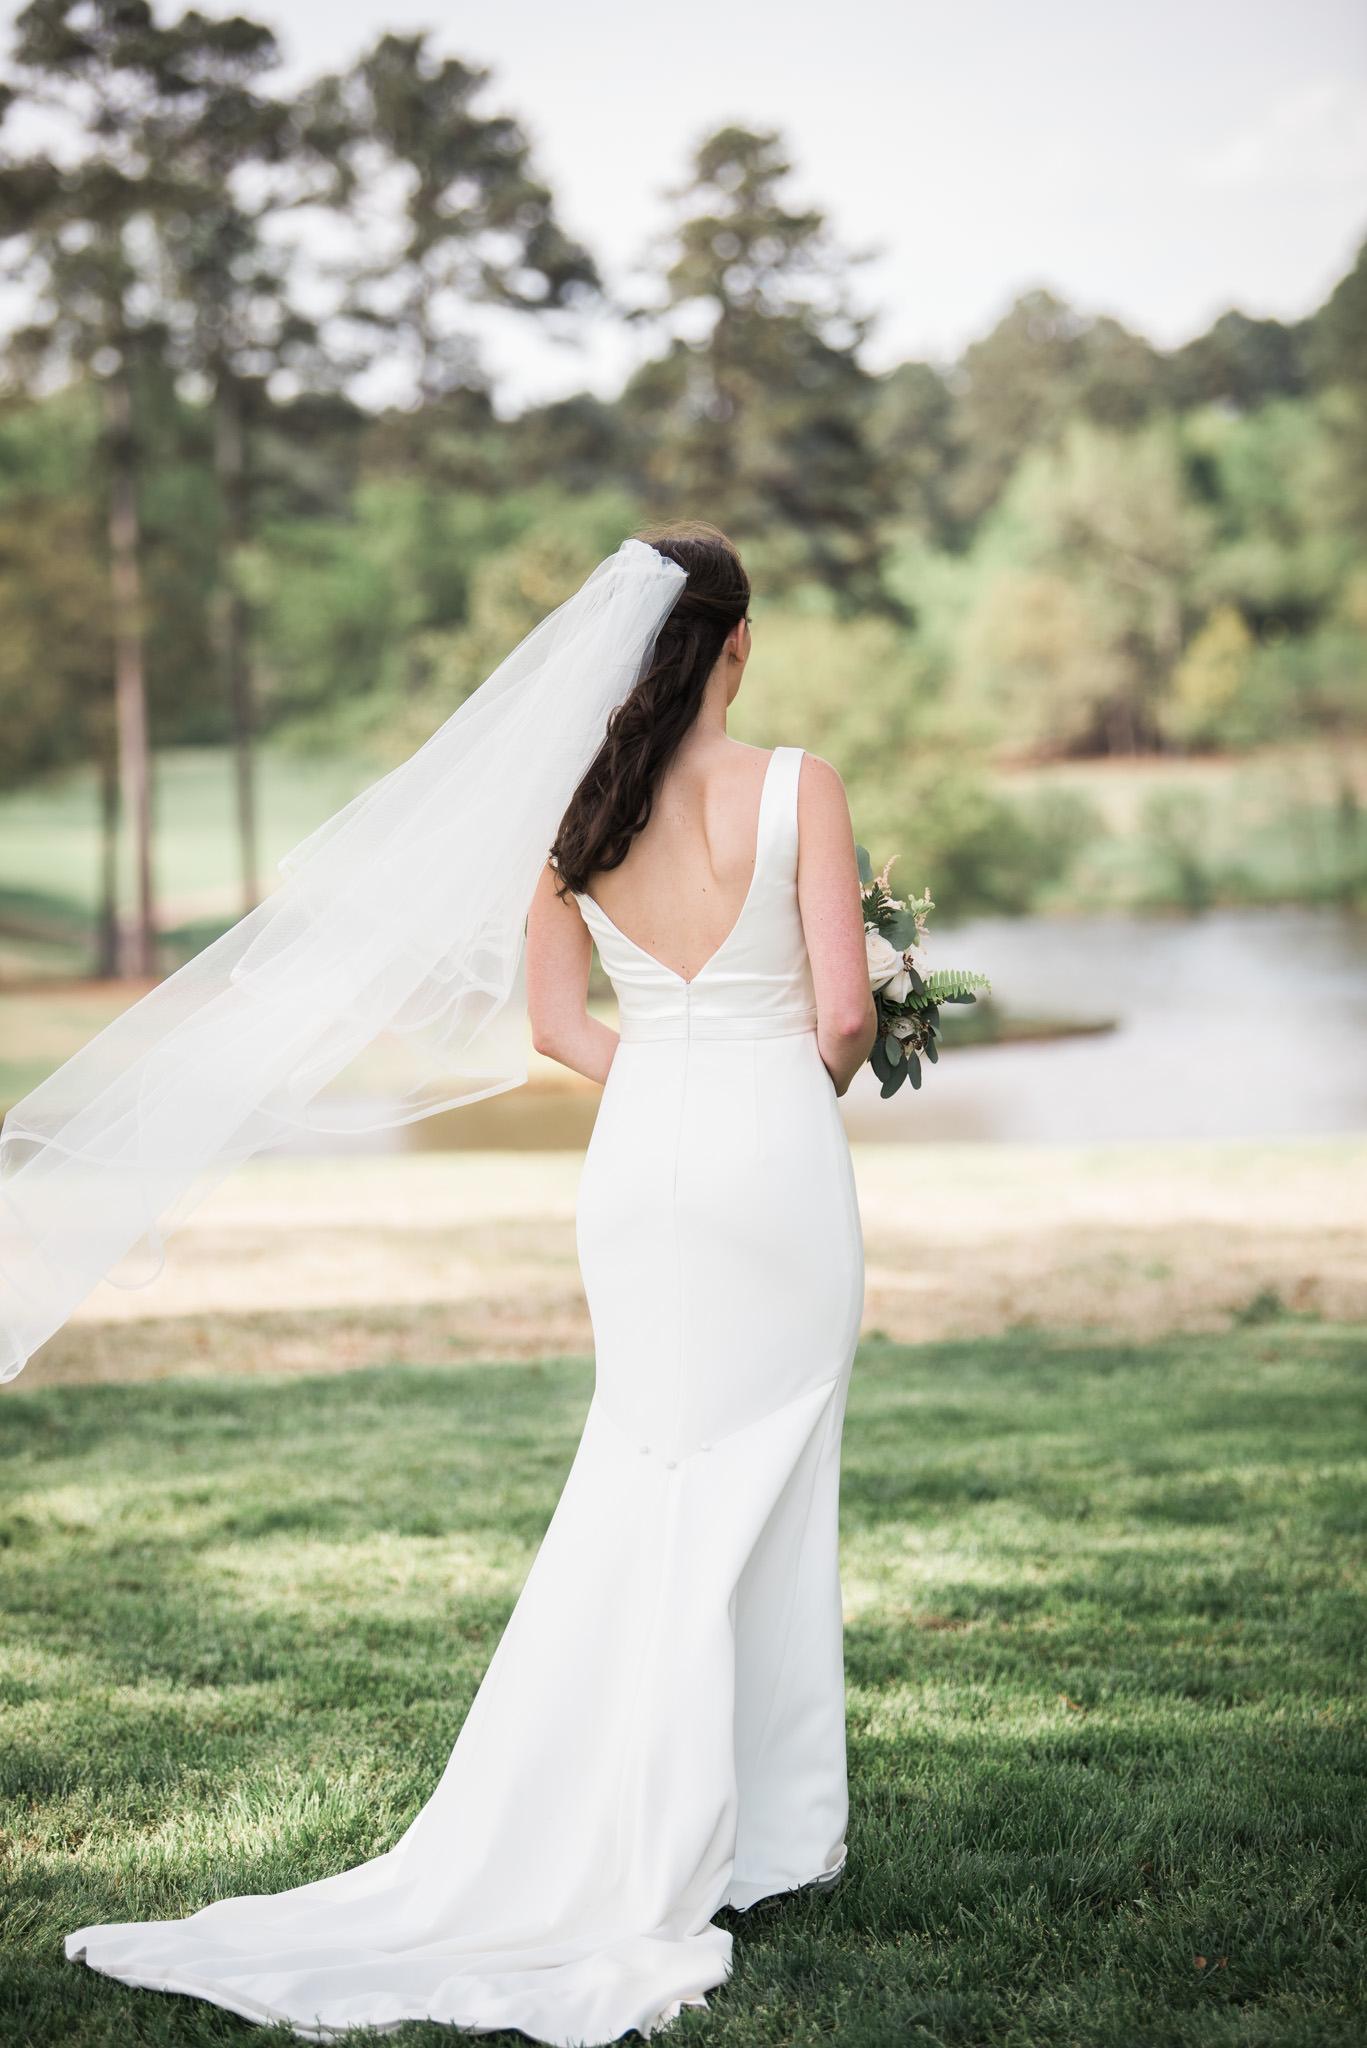 Athens-wedding-dress-55.jpg